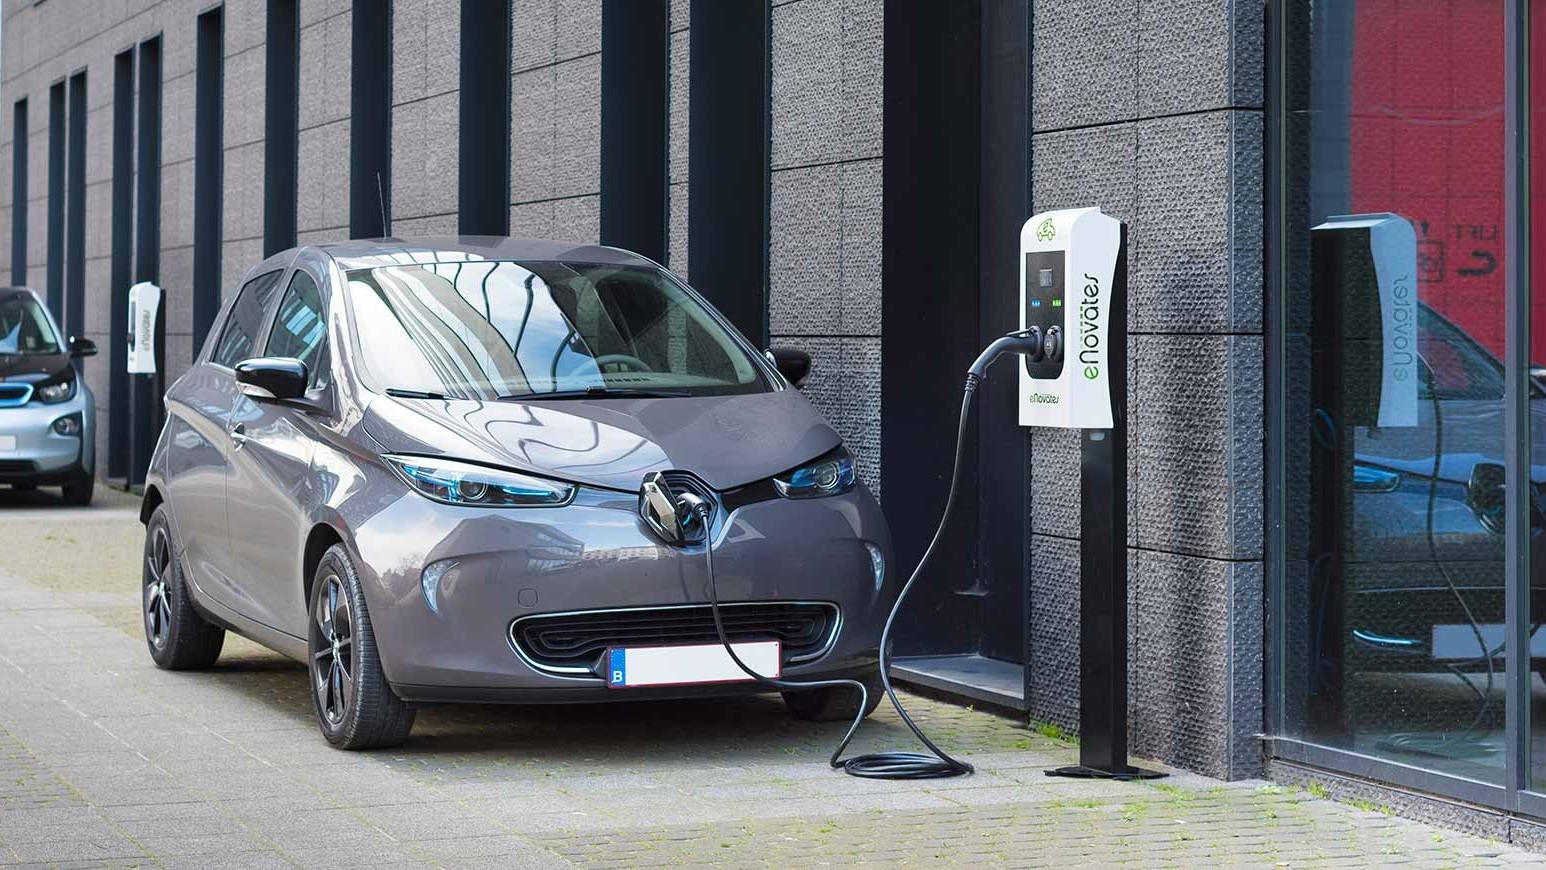 eNovates Car Charging